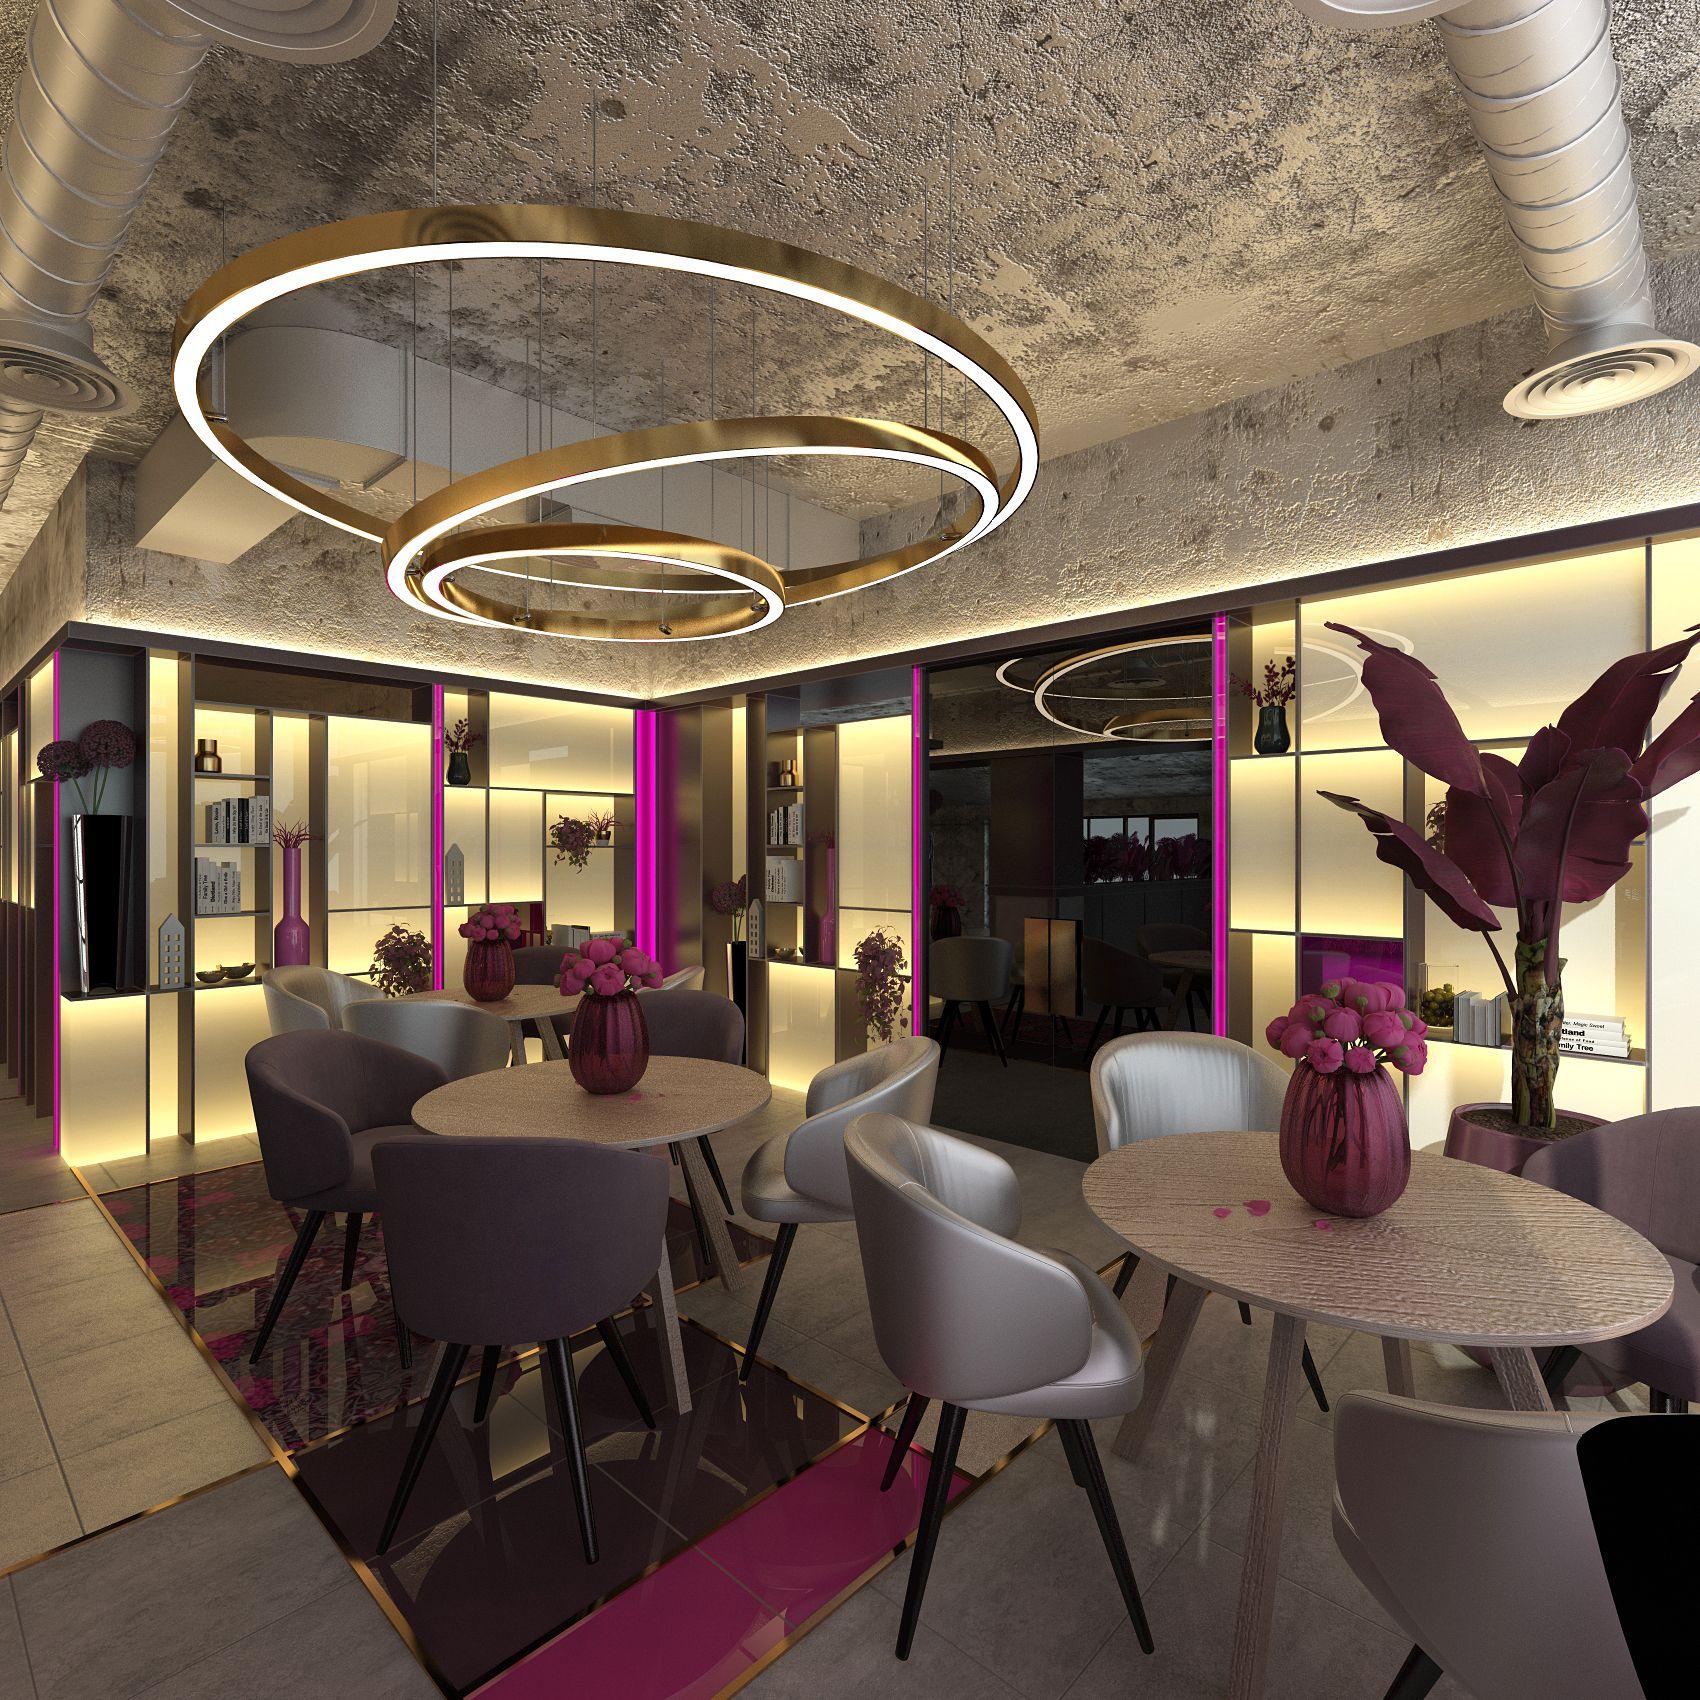 Дизайн-проект ресторана в стиле Мемфис